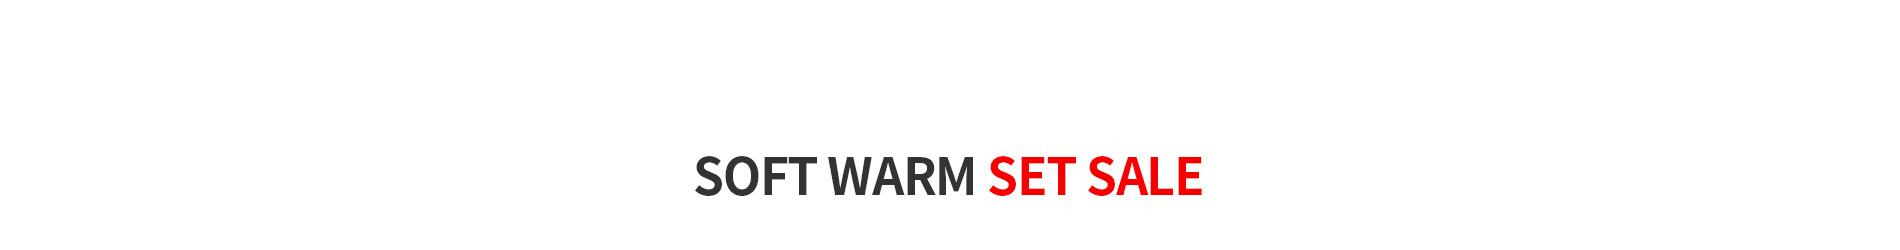 softwarm